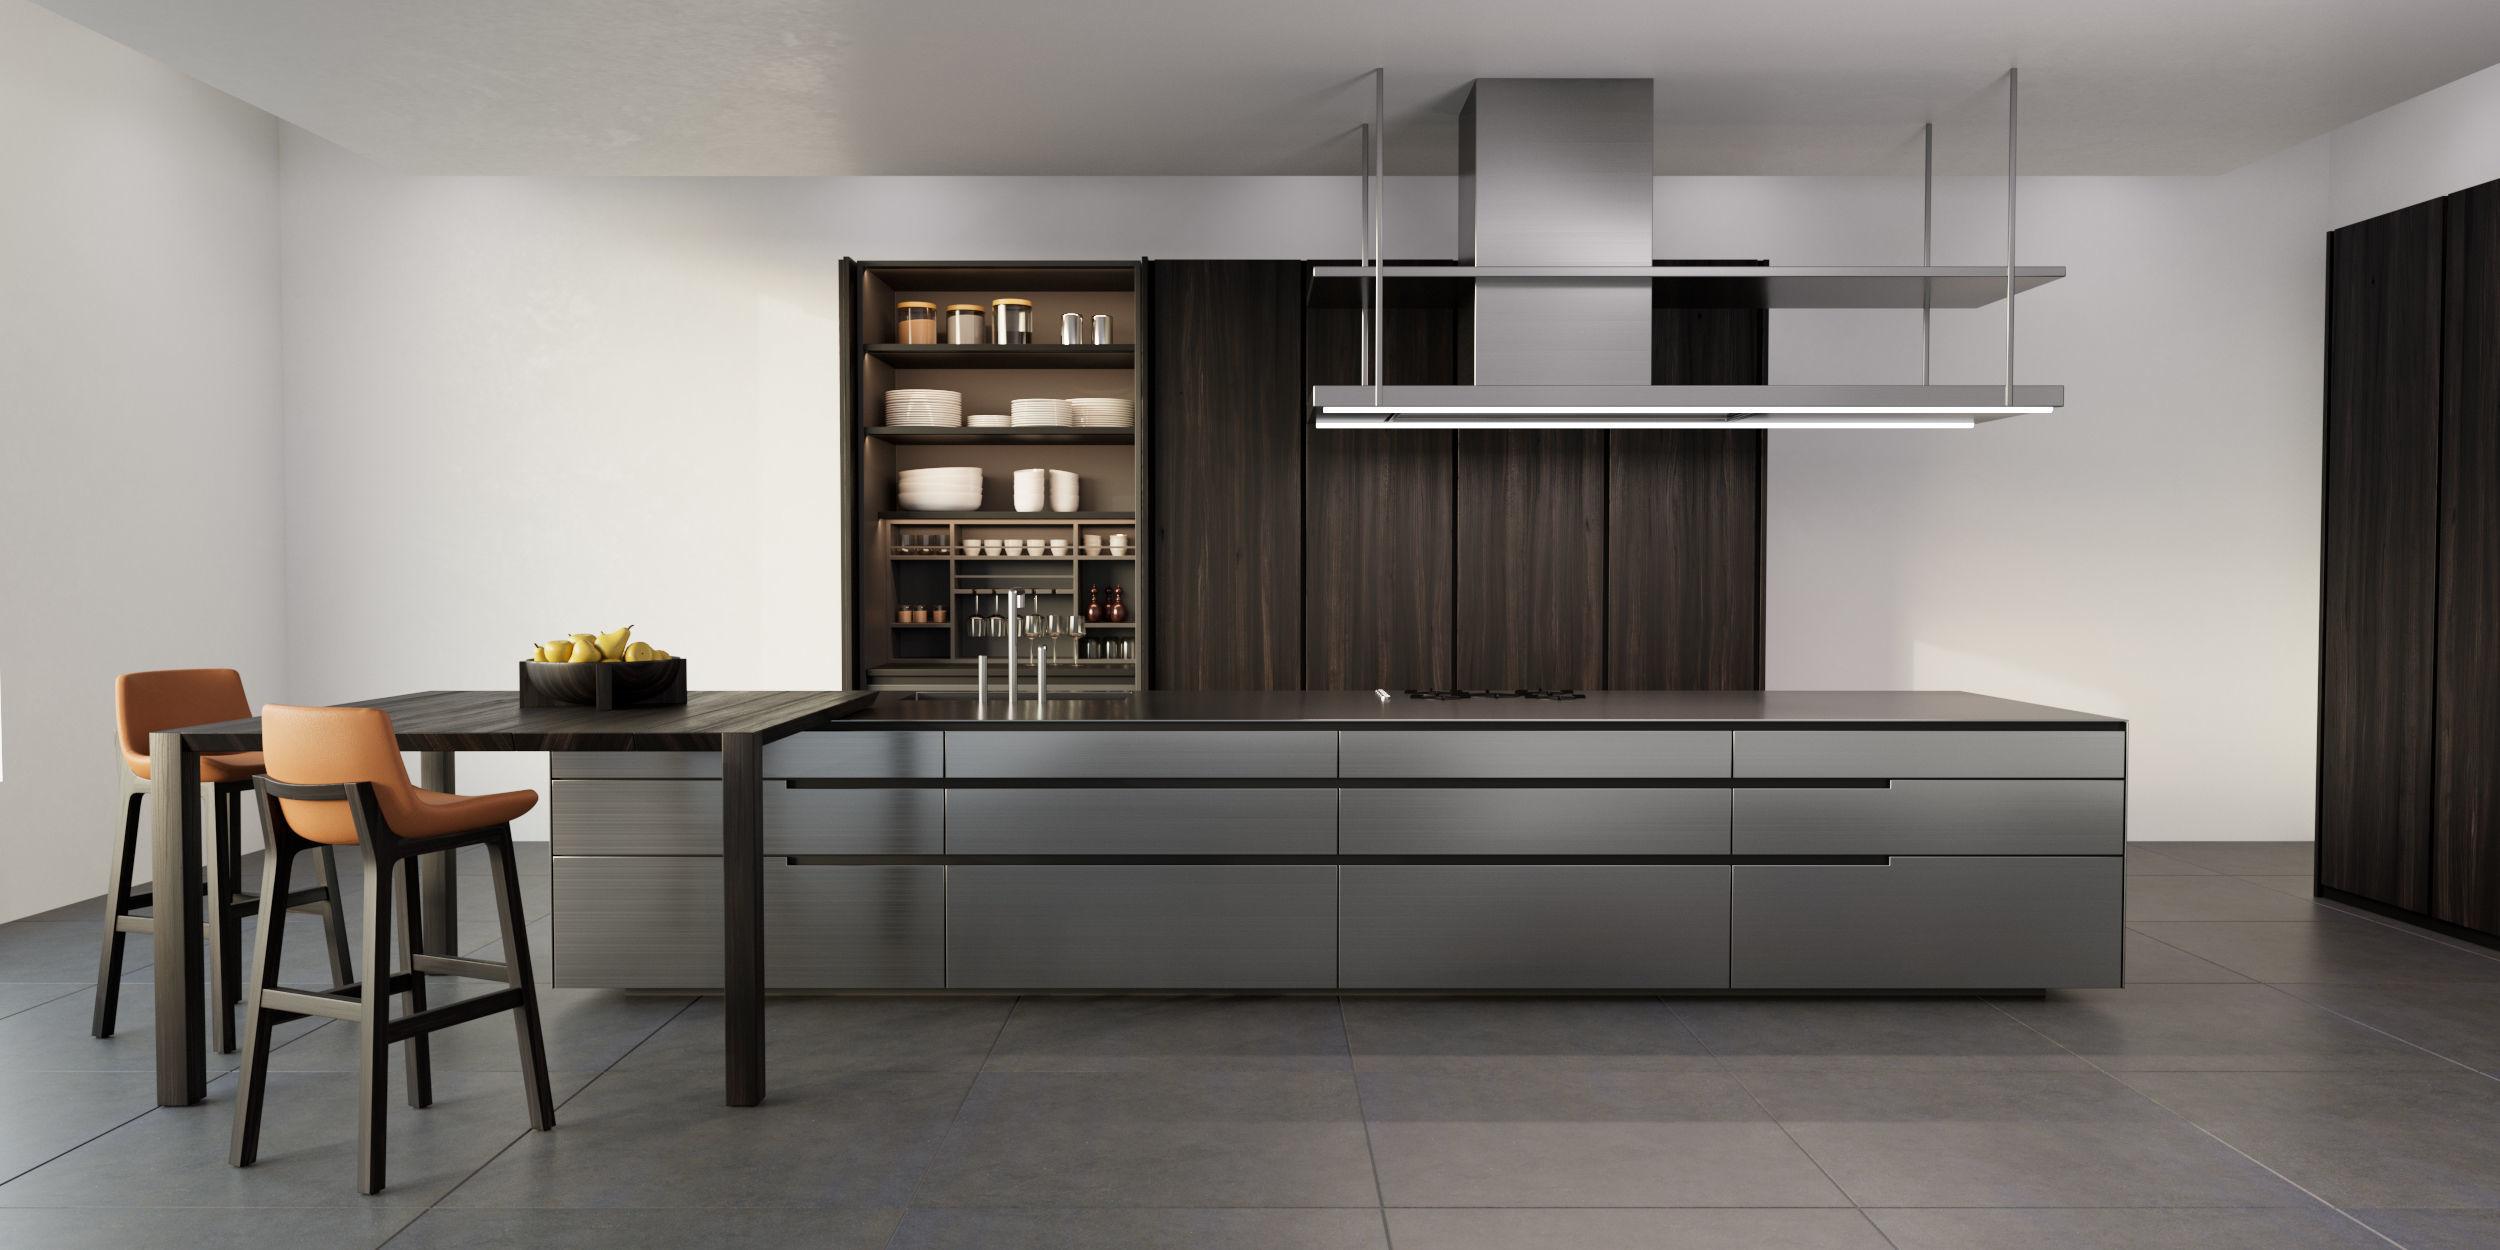 3D Poliform PHOENIX kitchen | CGTrader on Kitchen Model Images  id=95759